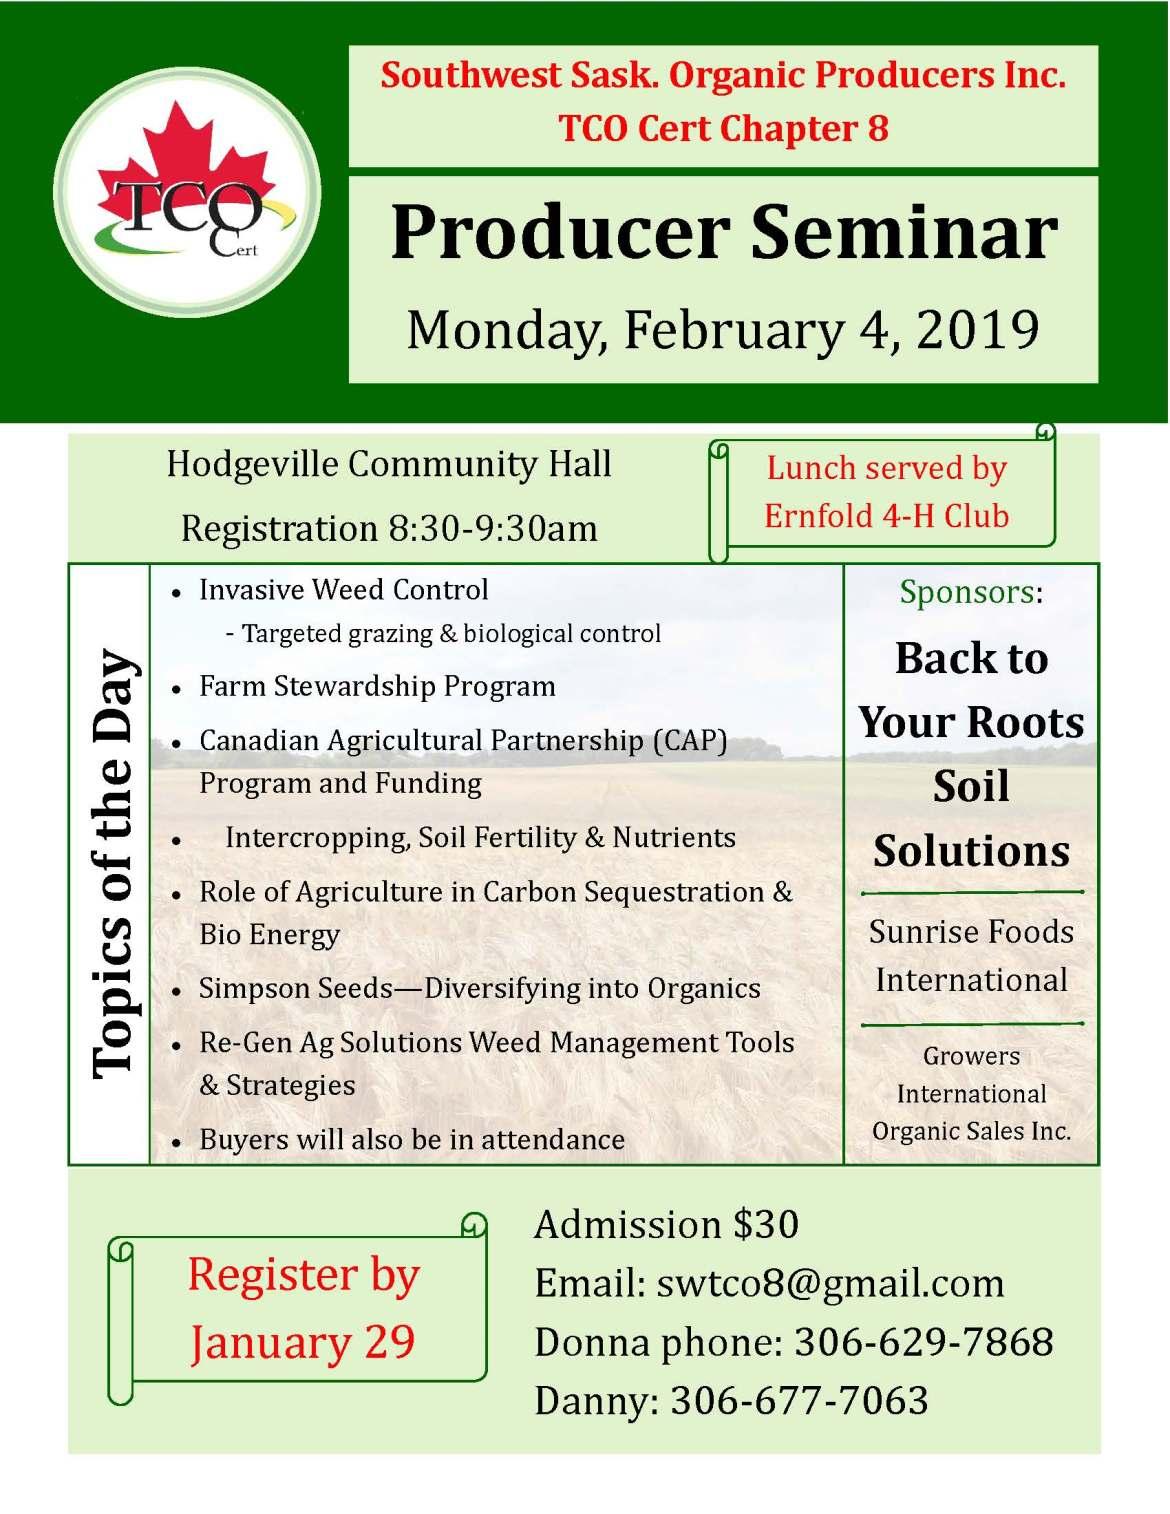 Organic Producer Seminar – Southwest Sask Organic Producers Chapter 8